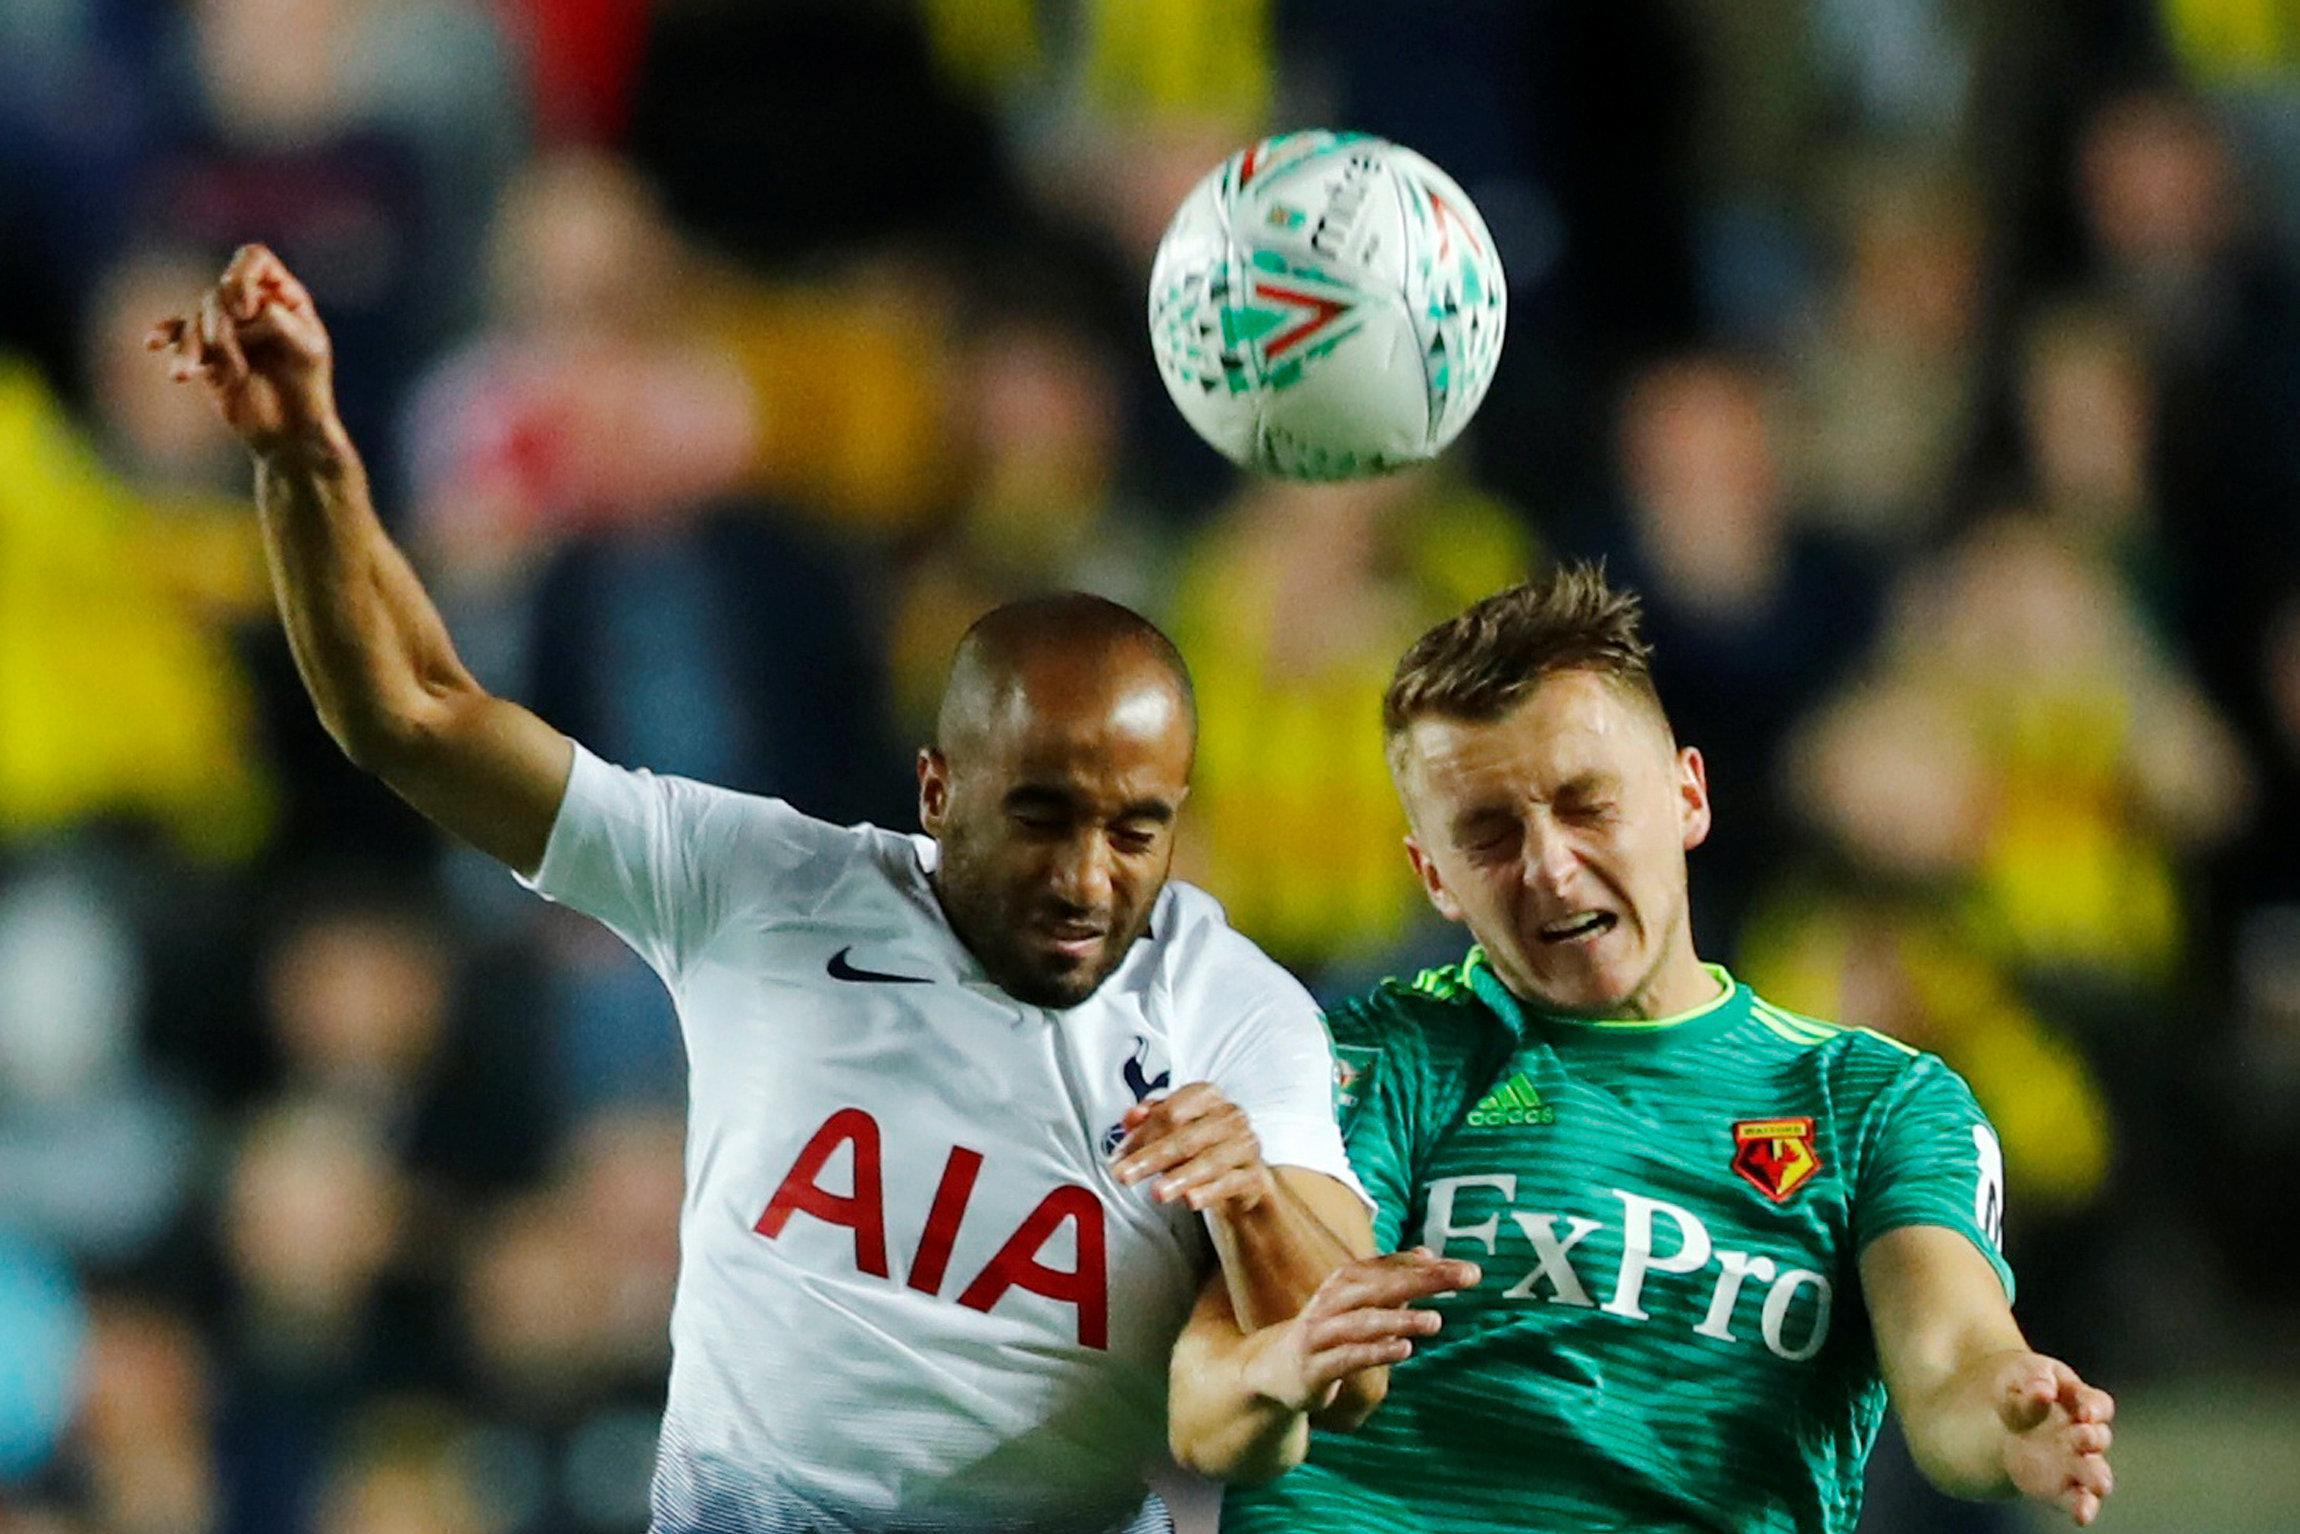 Watford defender Ben Wilmot uninvolved as England Under 21s beat Austria